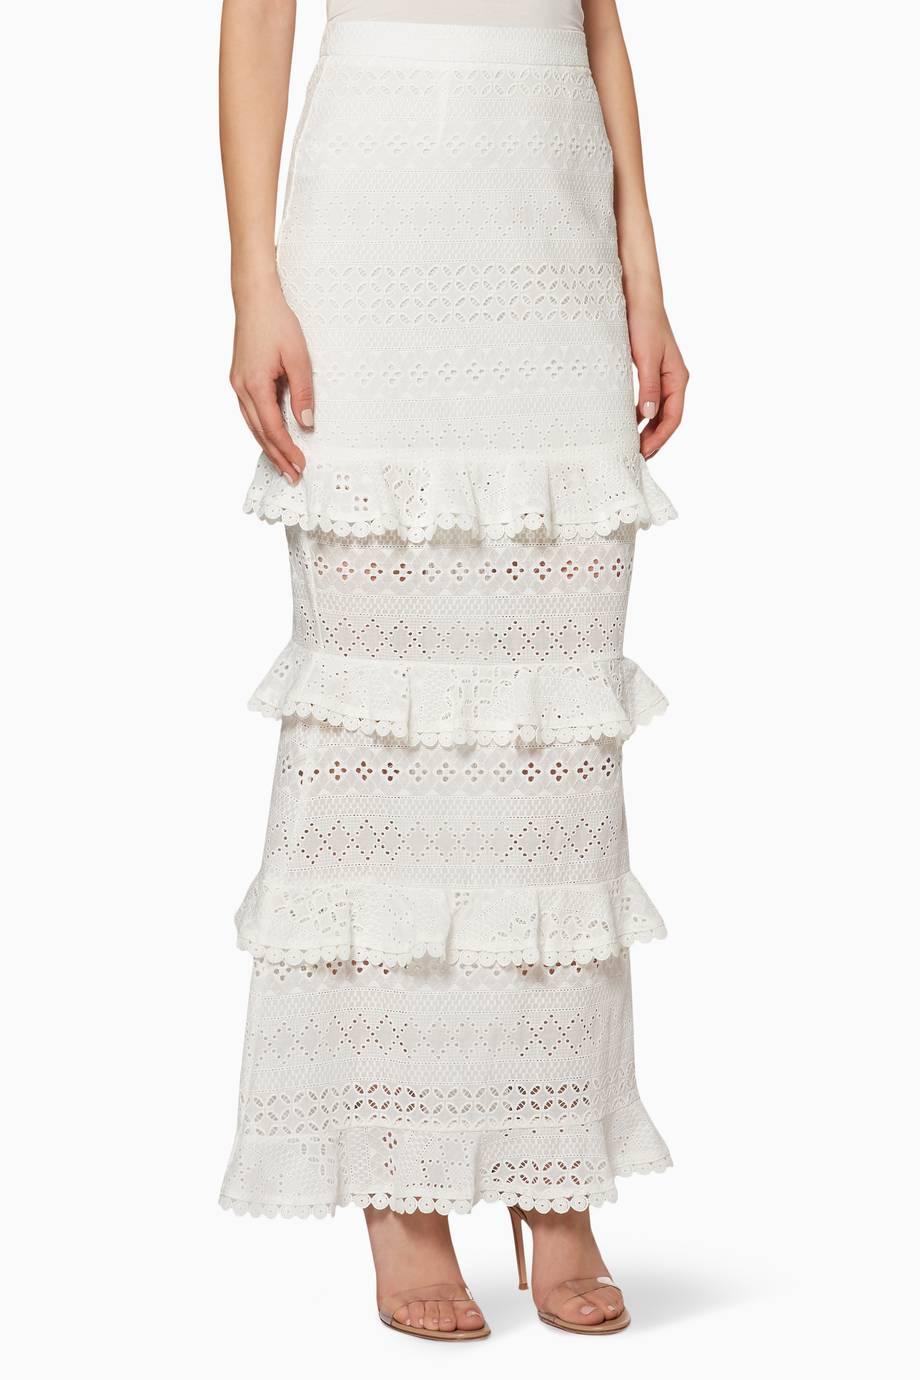 260abb55c26b8 تسوق White Ruffle-Trimmed Dupre Skirt من ازولو